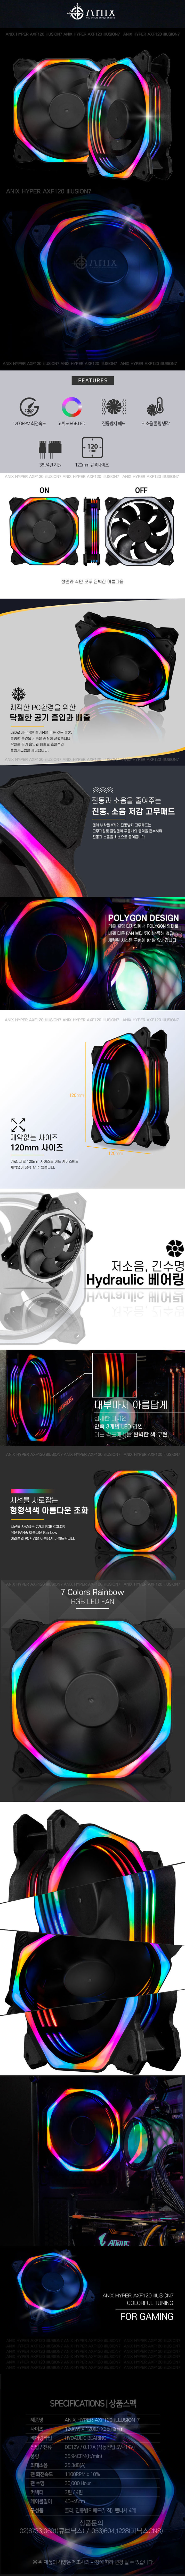 ANIX HYPER AXF120 RGB